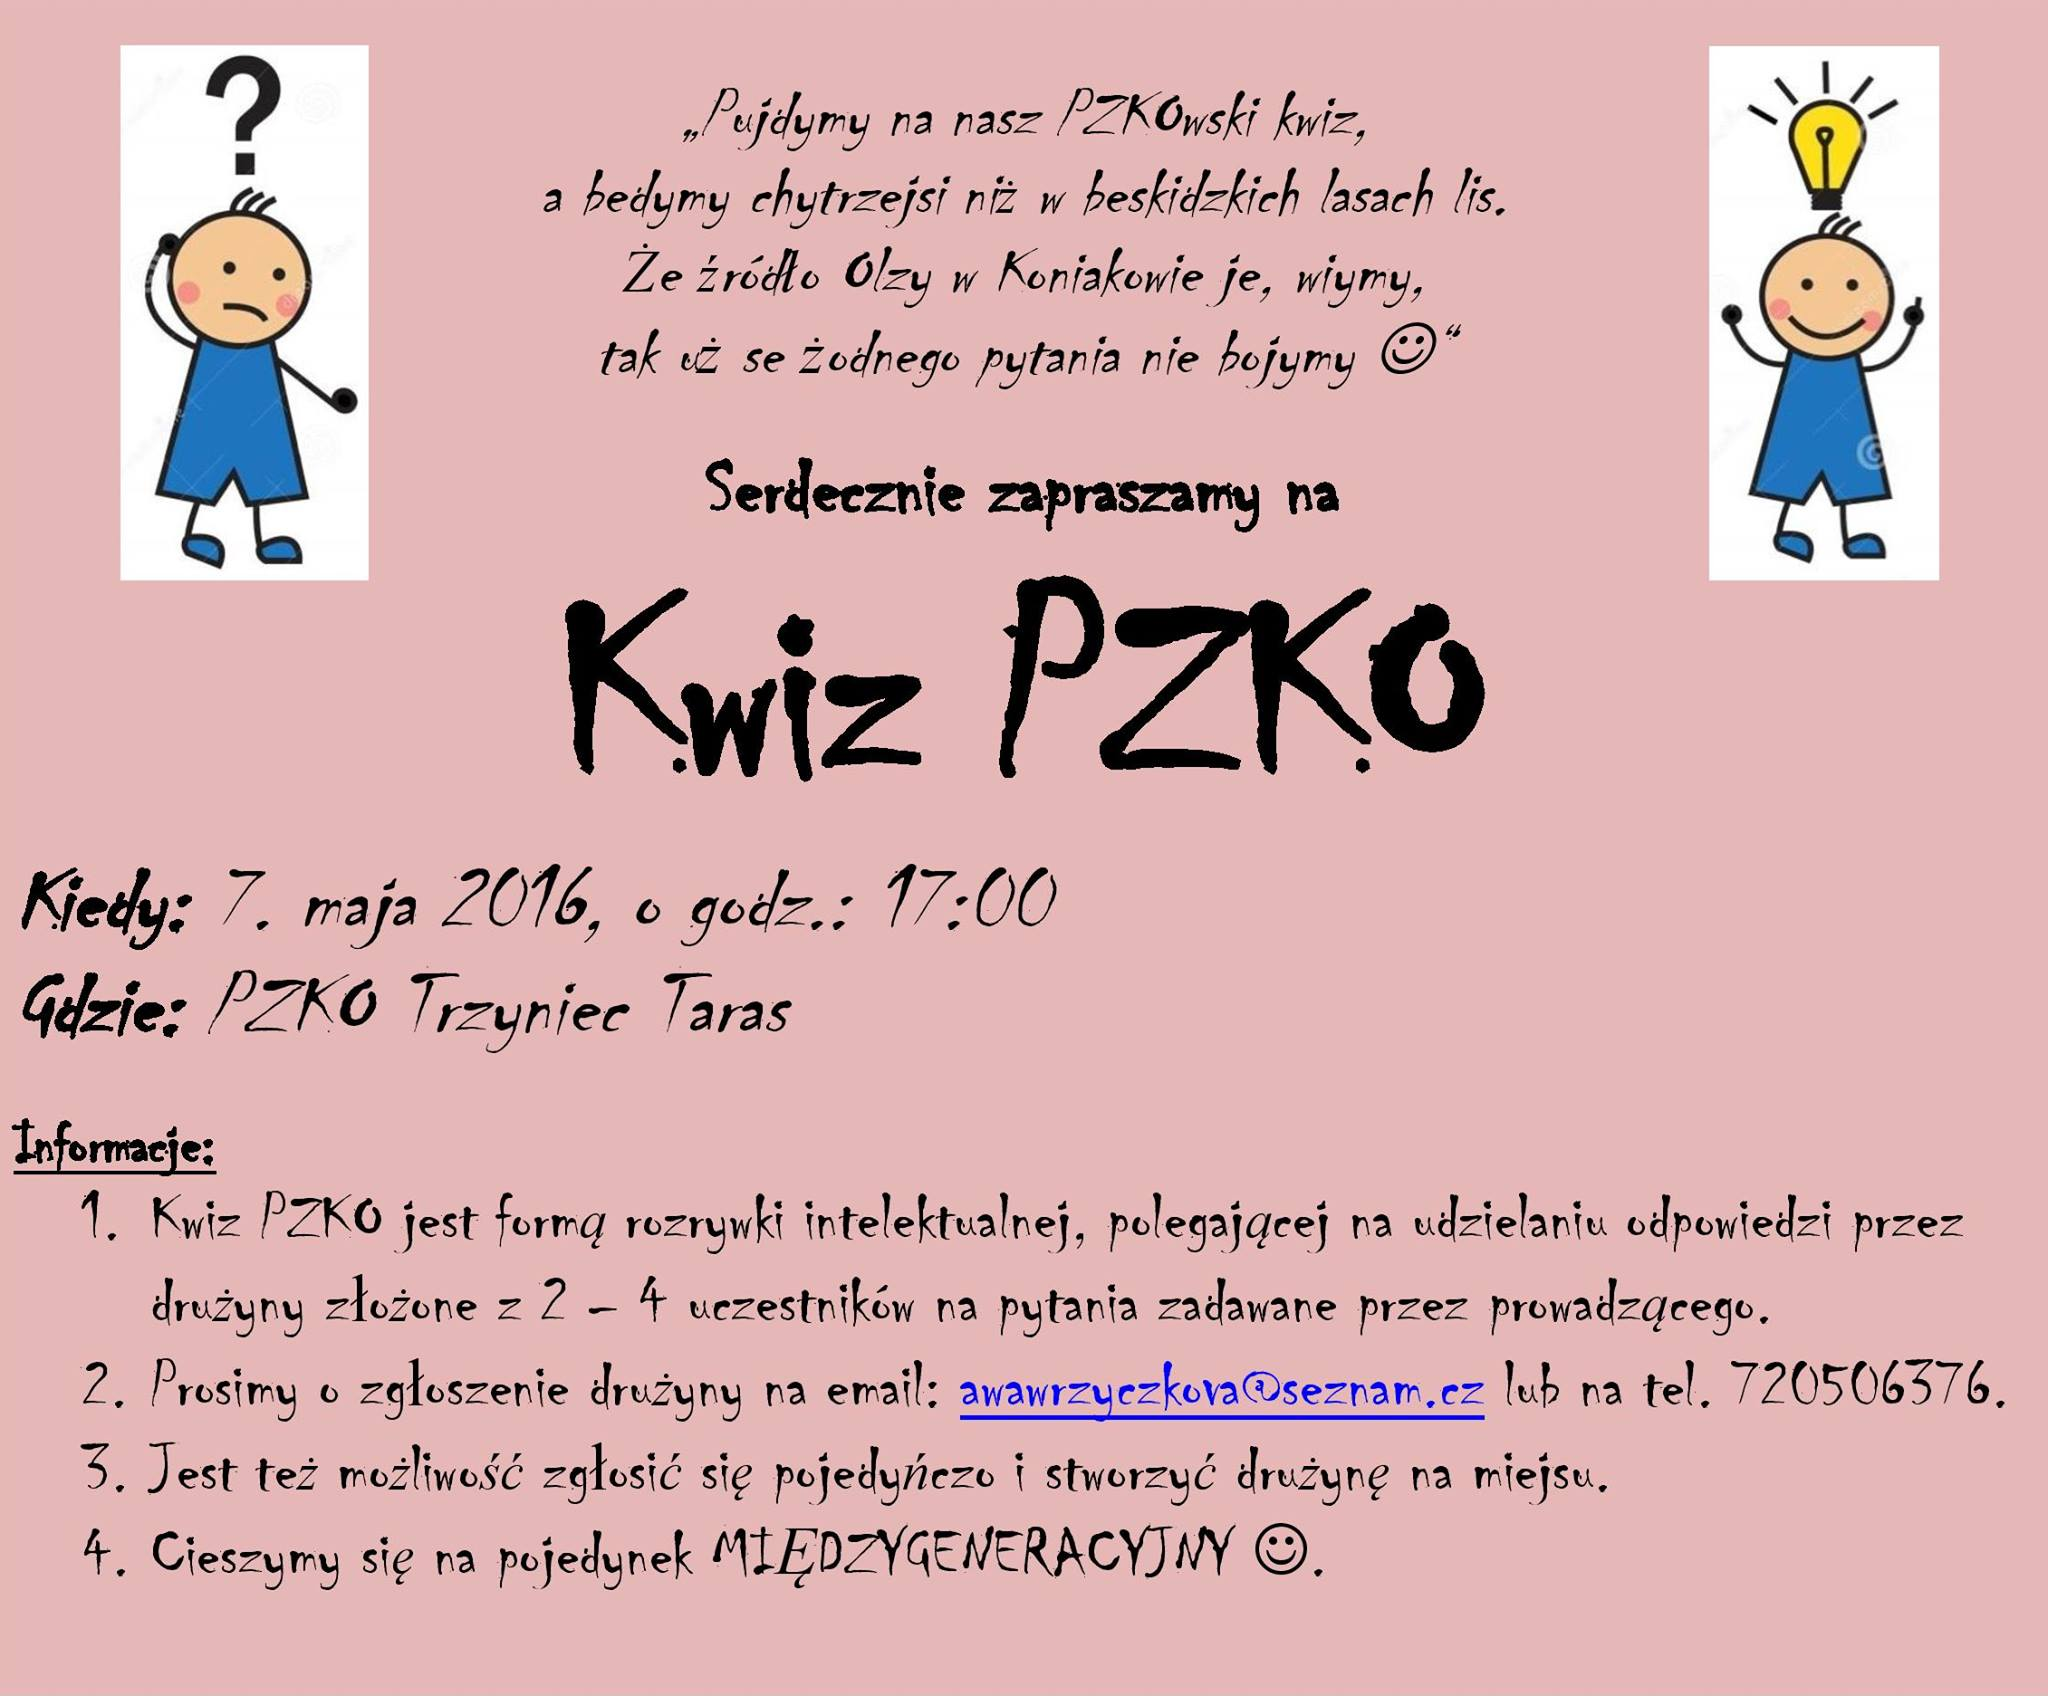 Kwiz PZKO